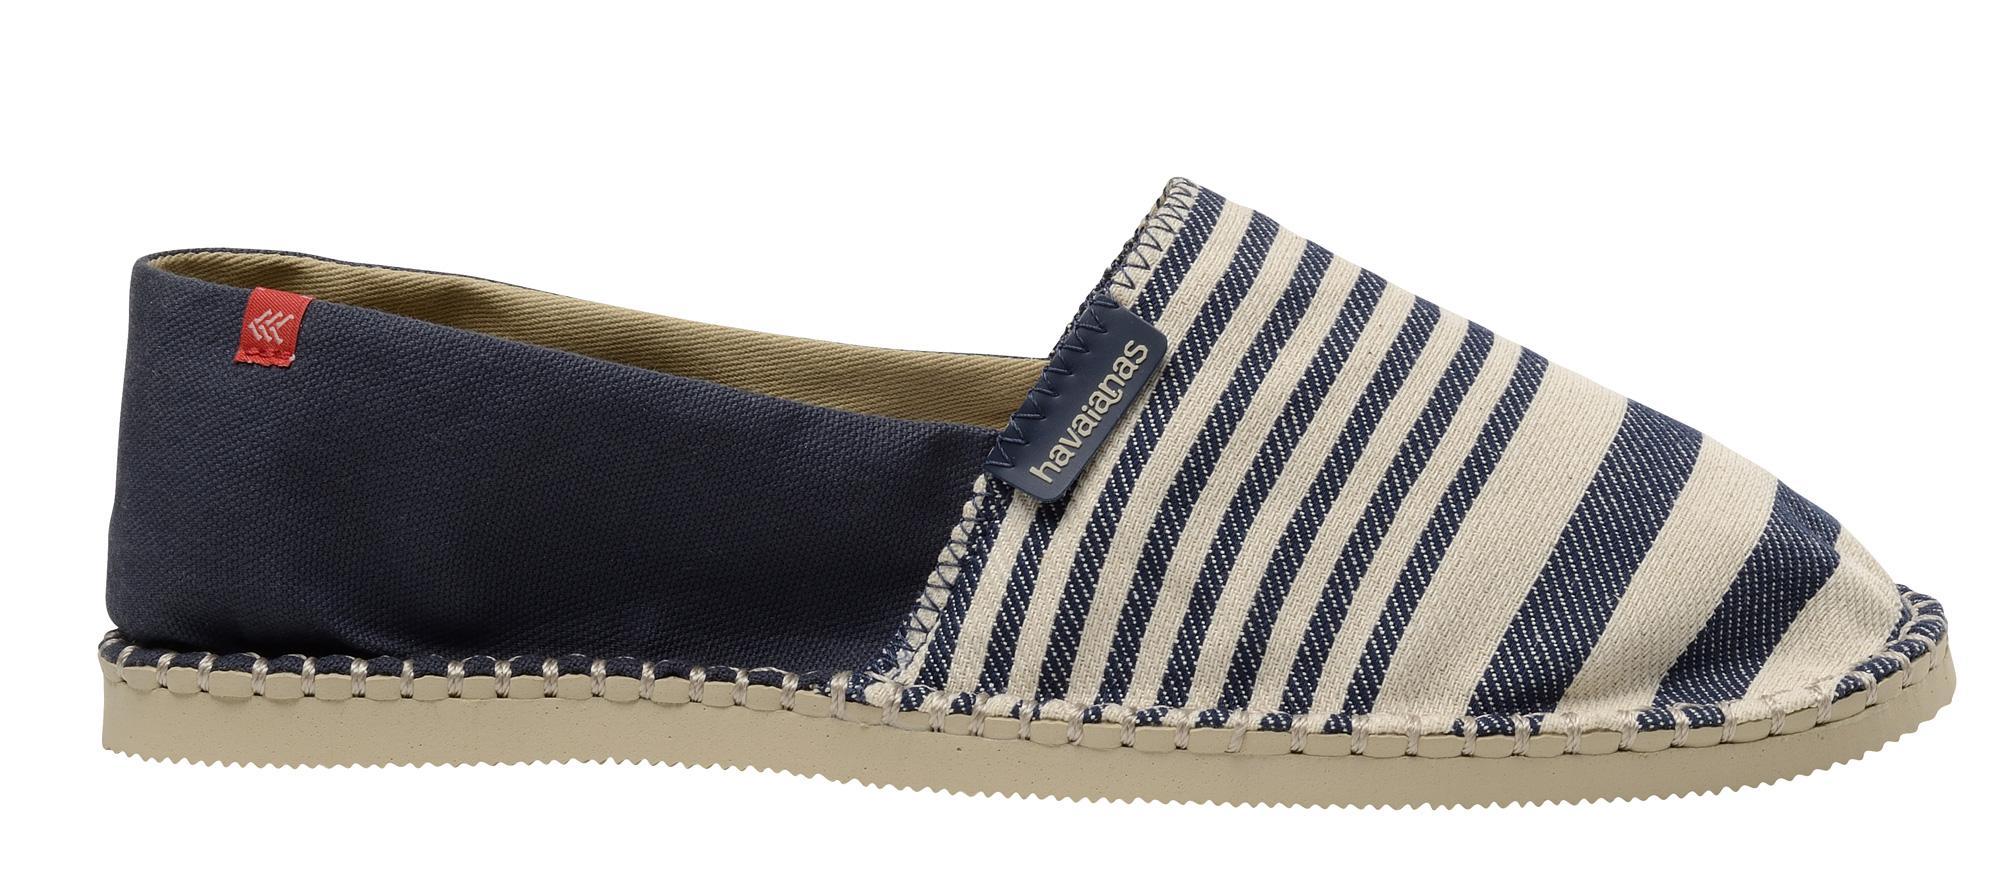 0e196a4ac722bd Espadrillas Havaianas Origine II scarpe uomo Blu/Beige 41392820716 ...